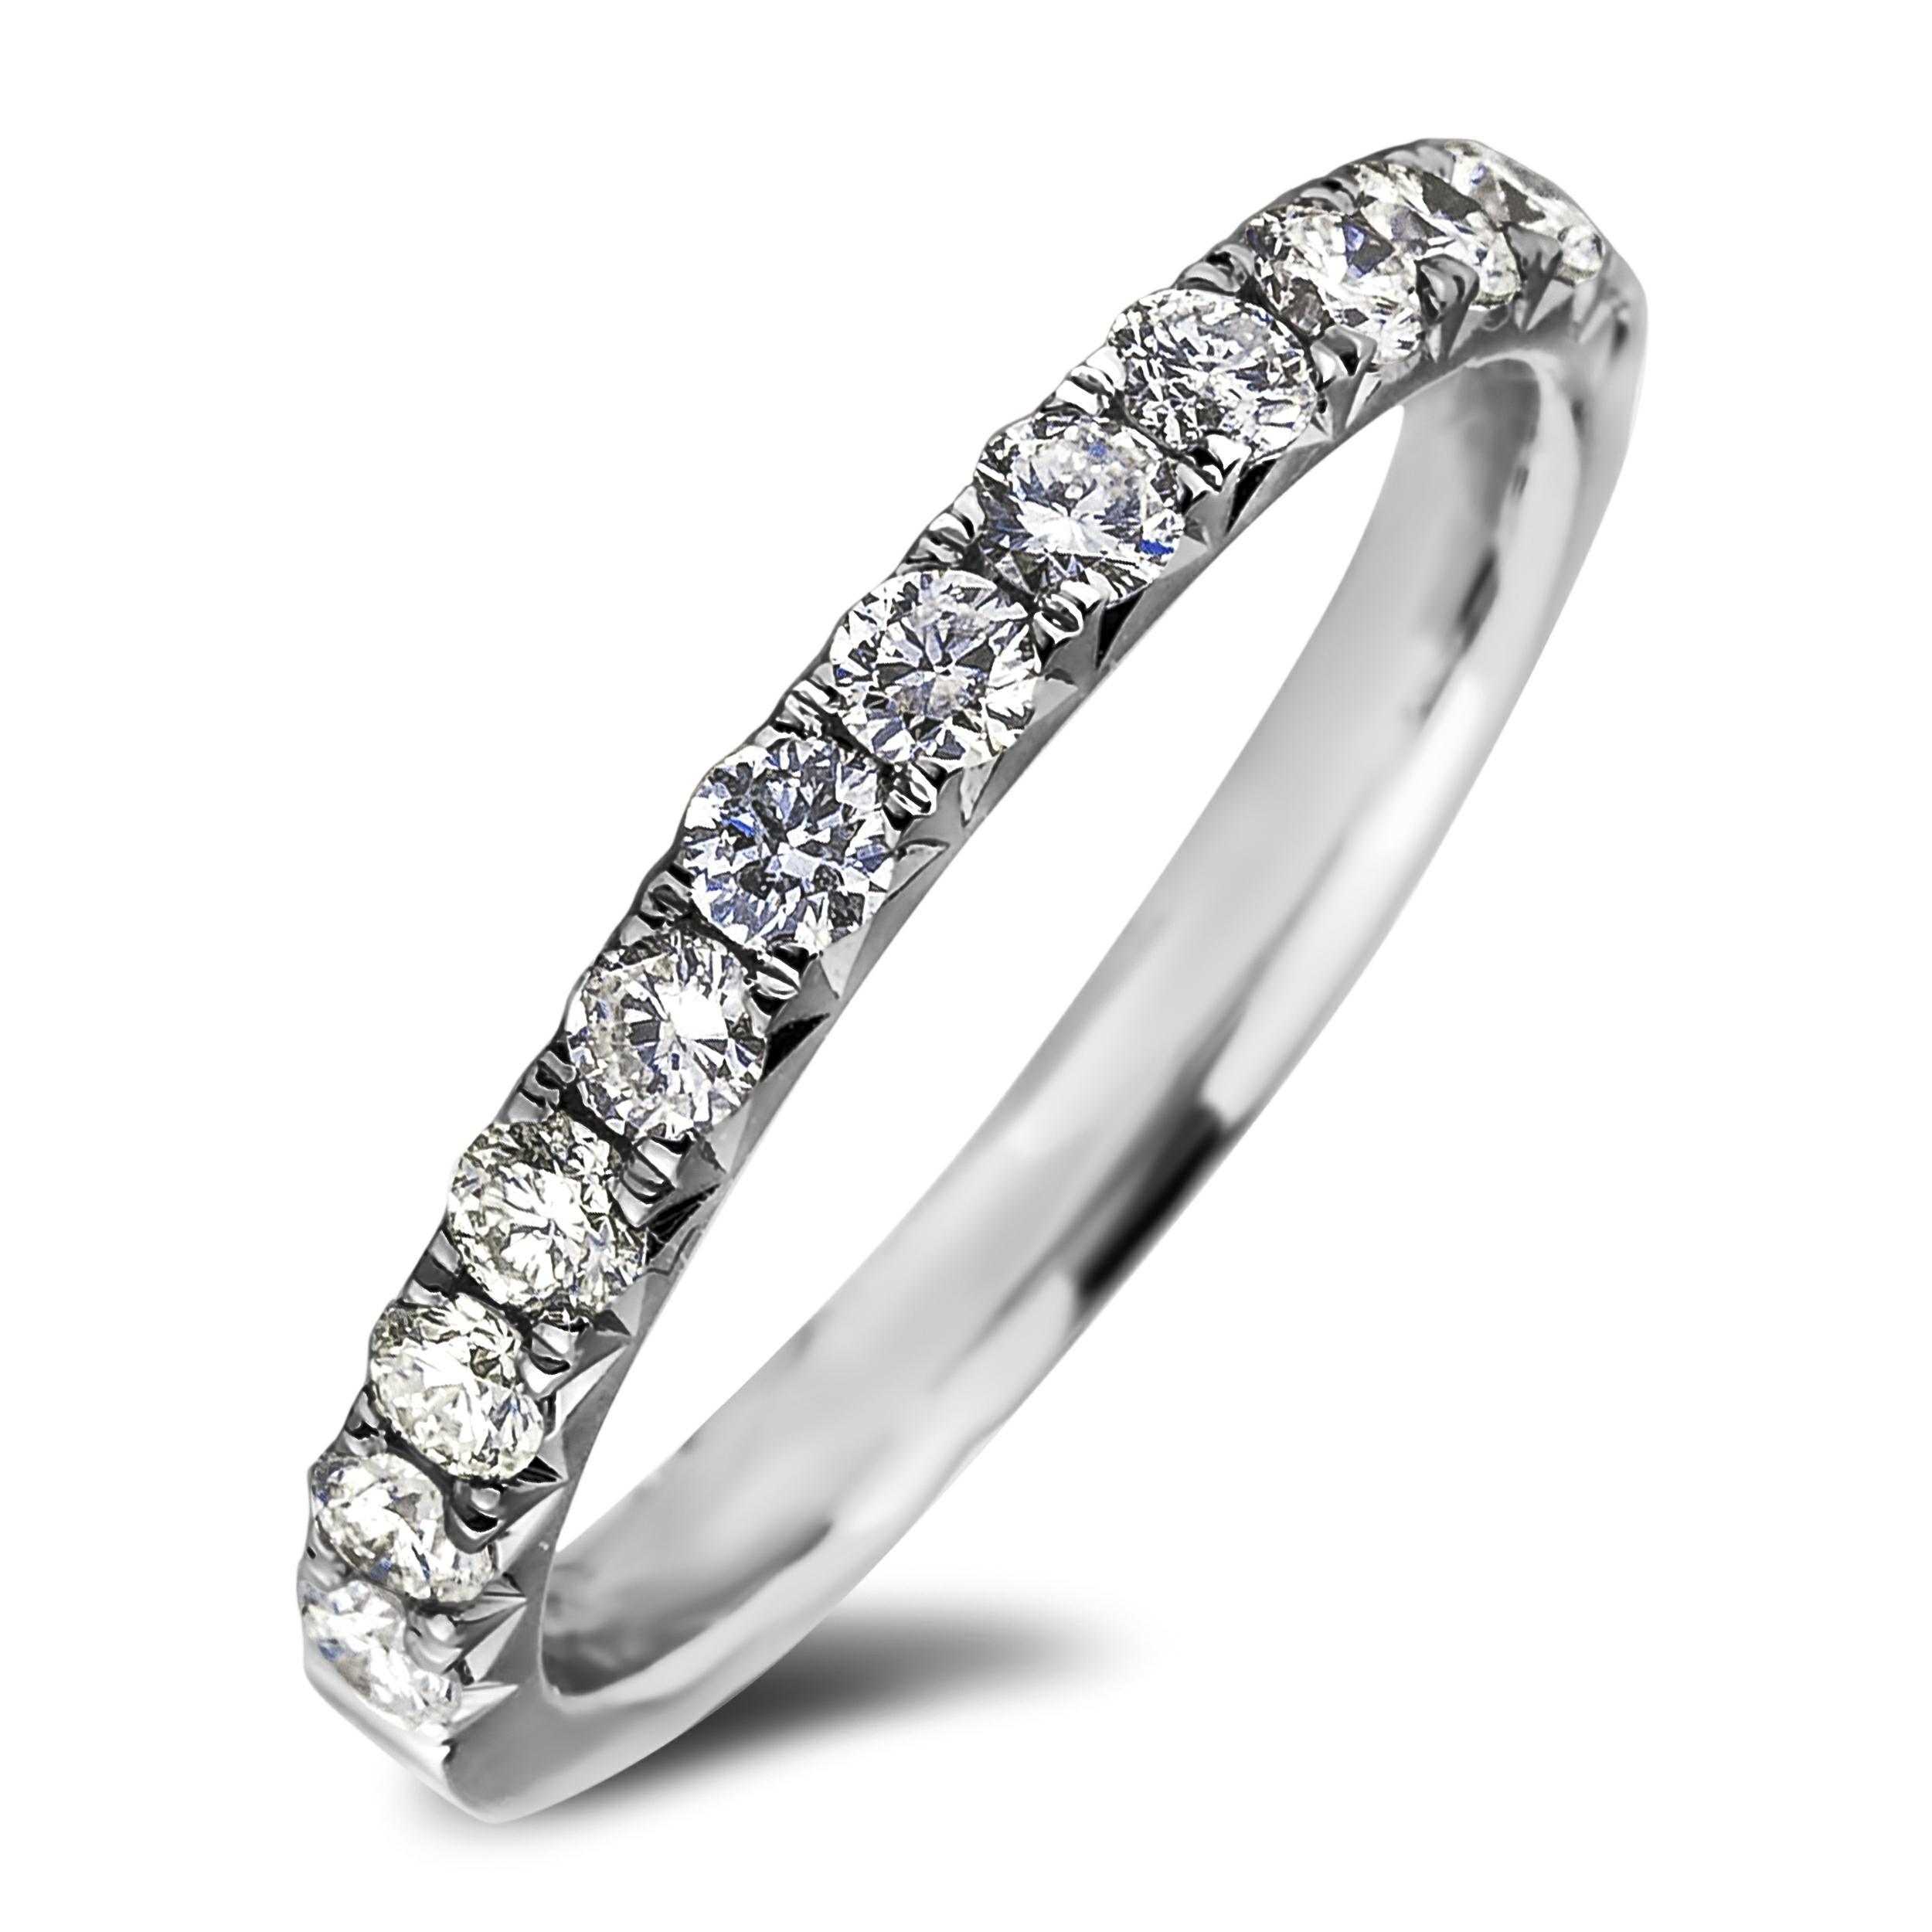 Diamond Anniversary Rings AFDR0691 (Rings)